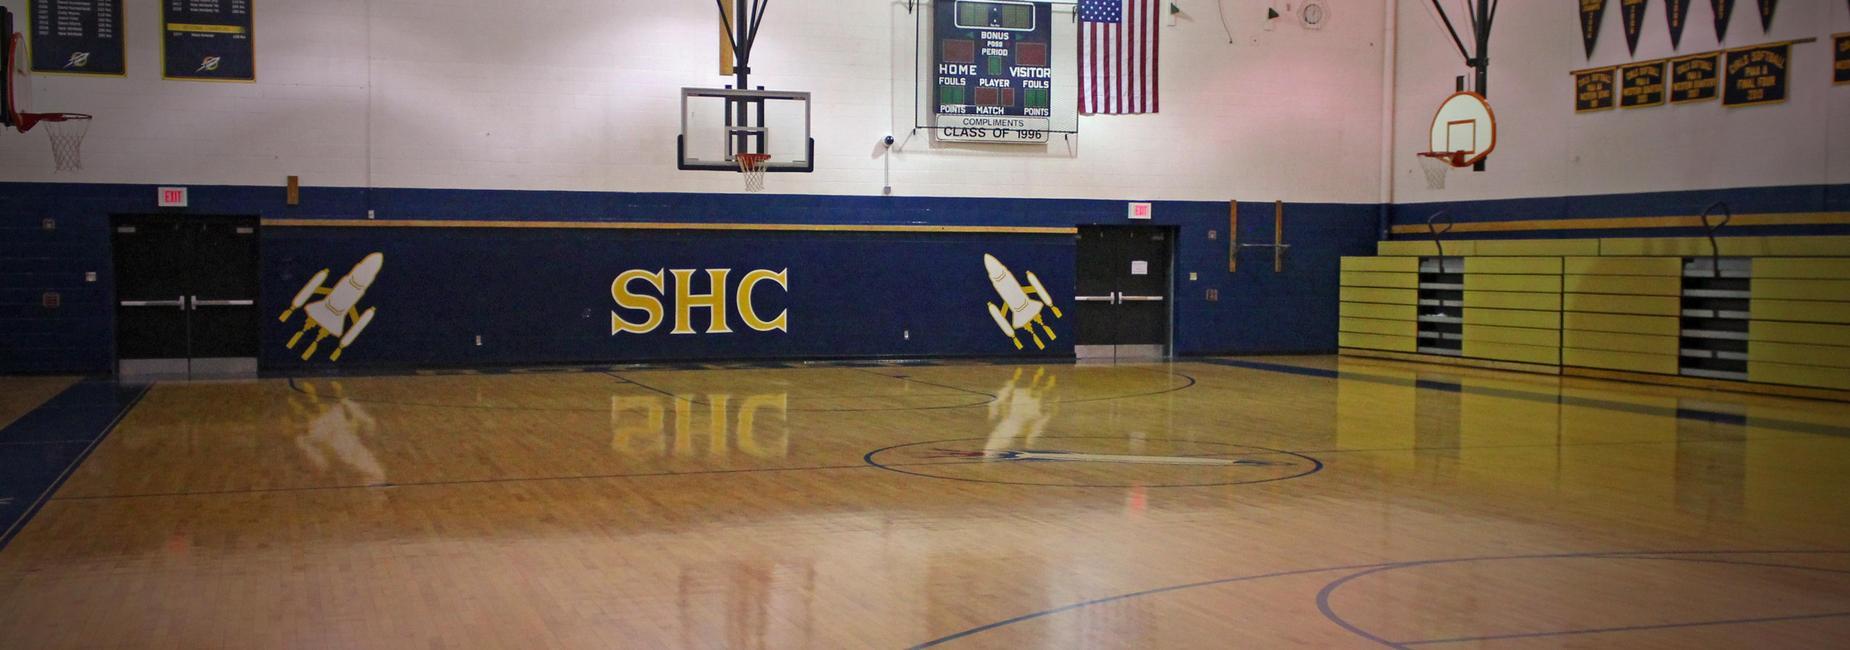 SHCSD Gymnasium